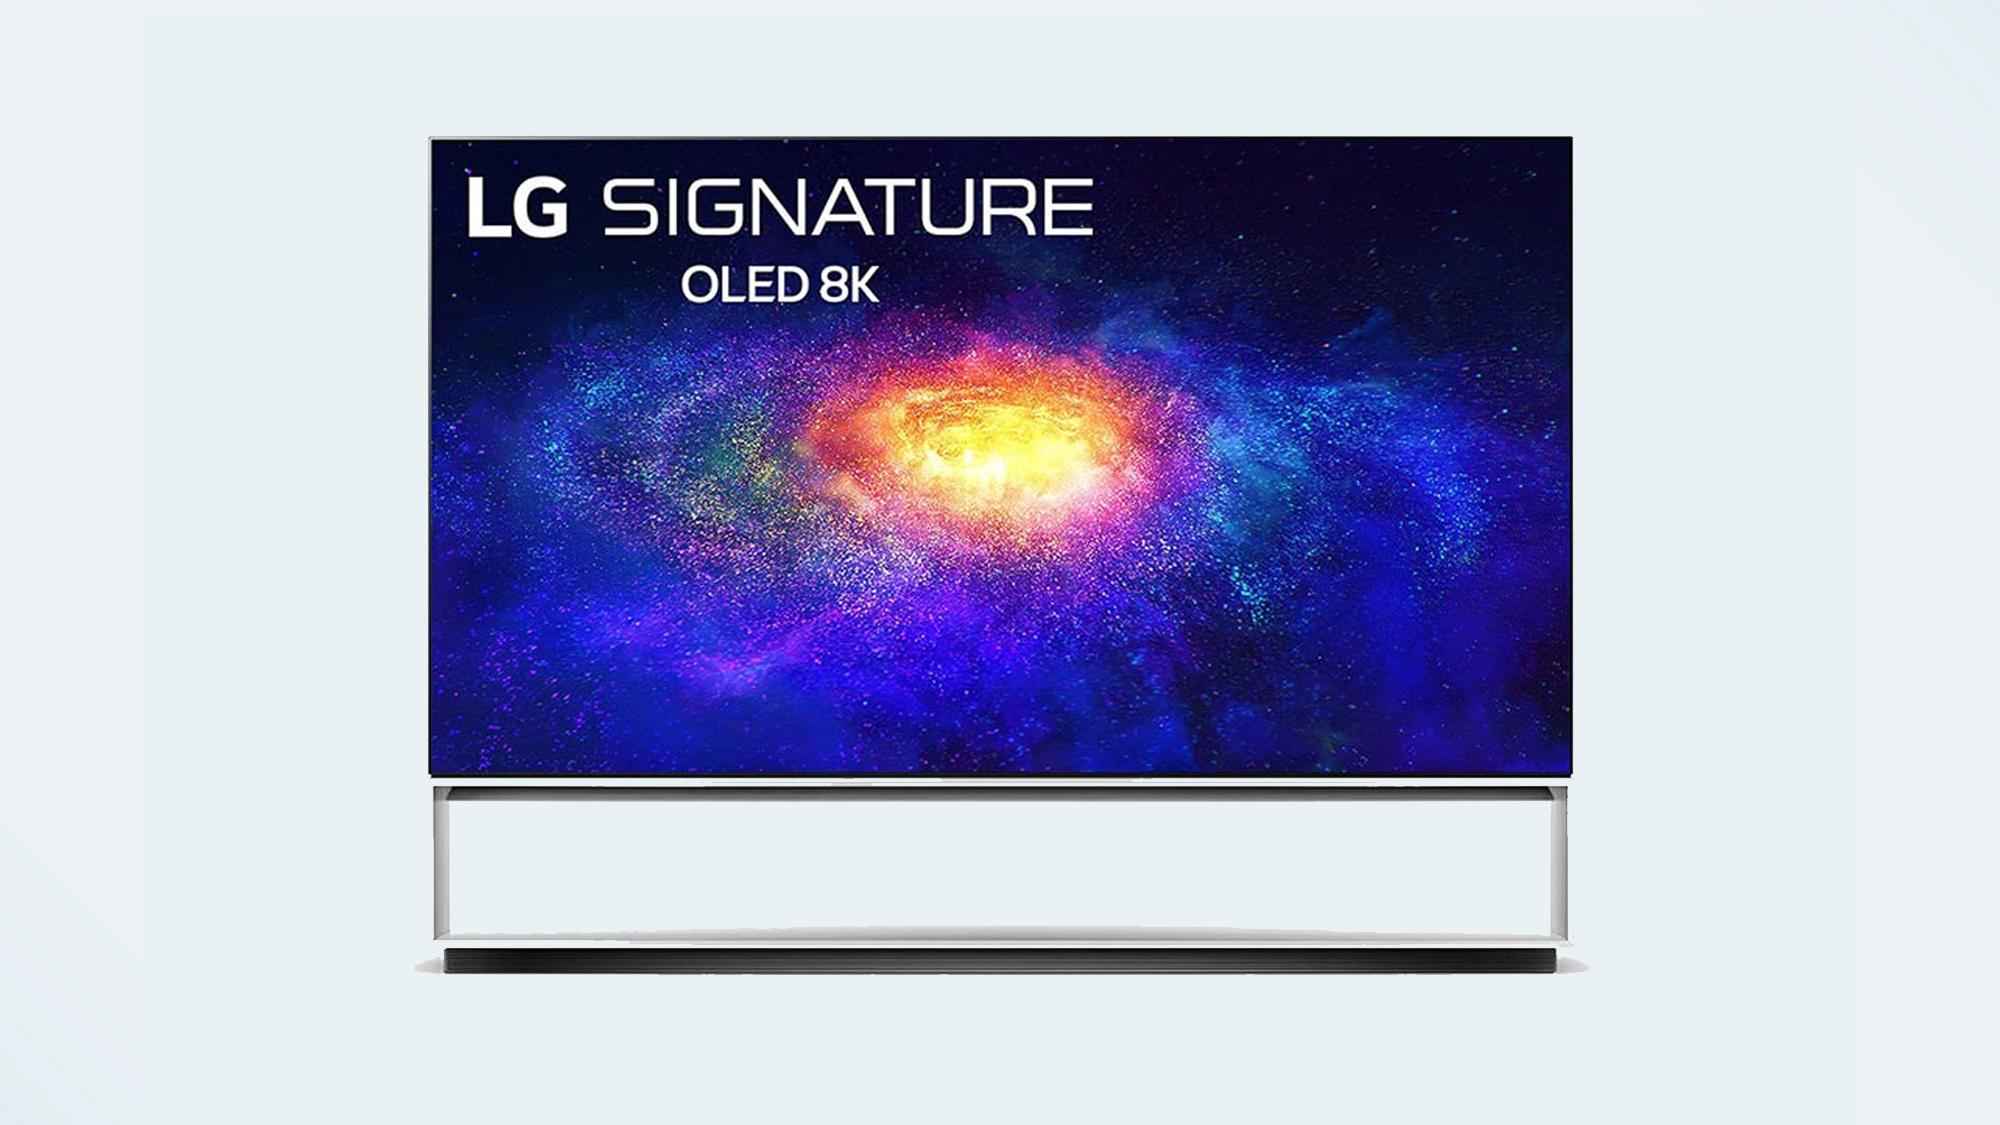 Best 8K TVs: LG ZX 8K OLED